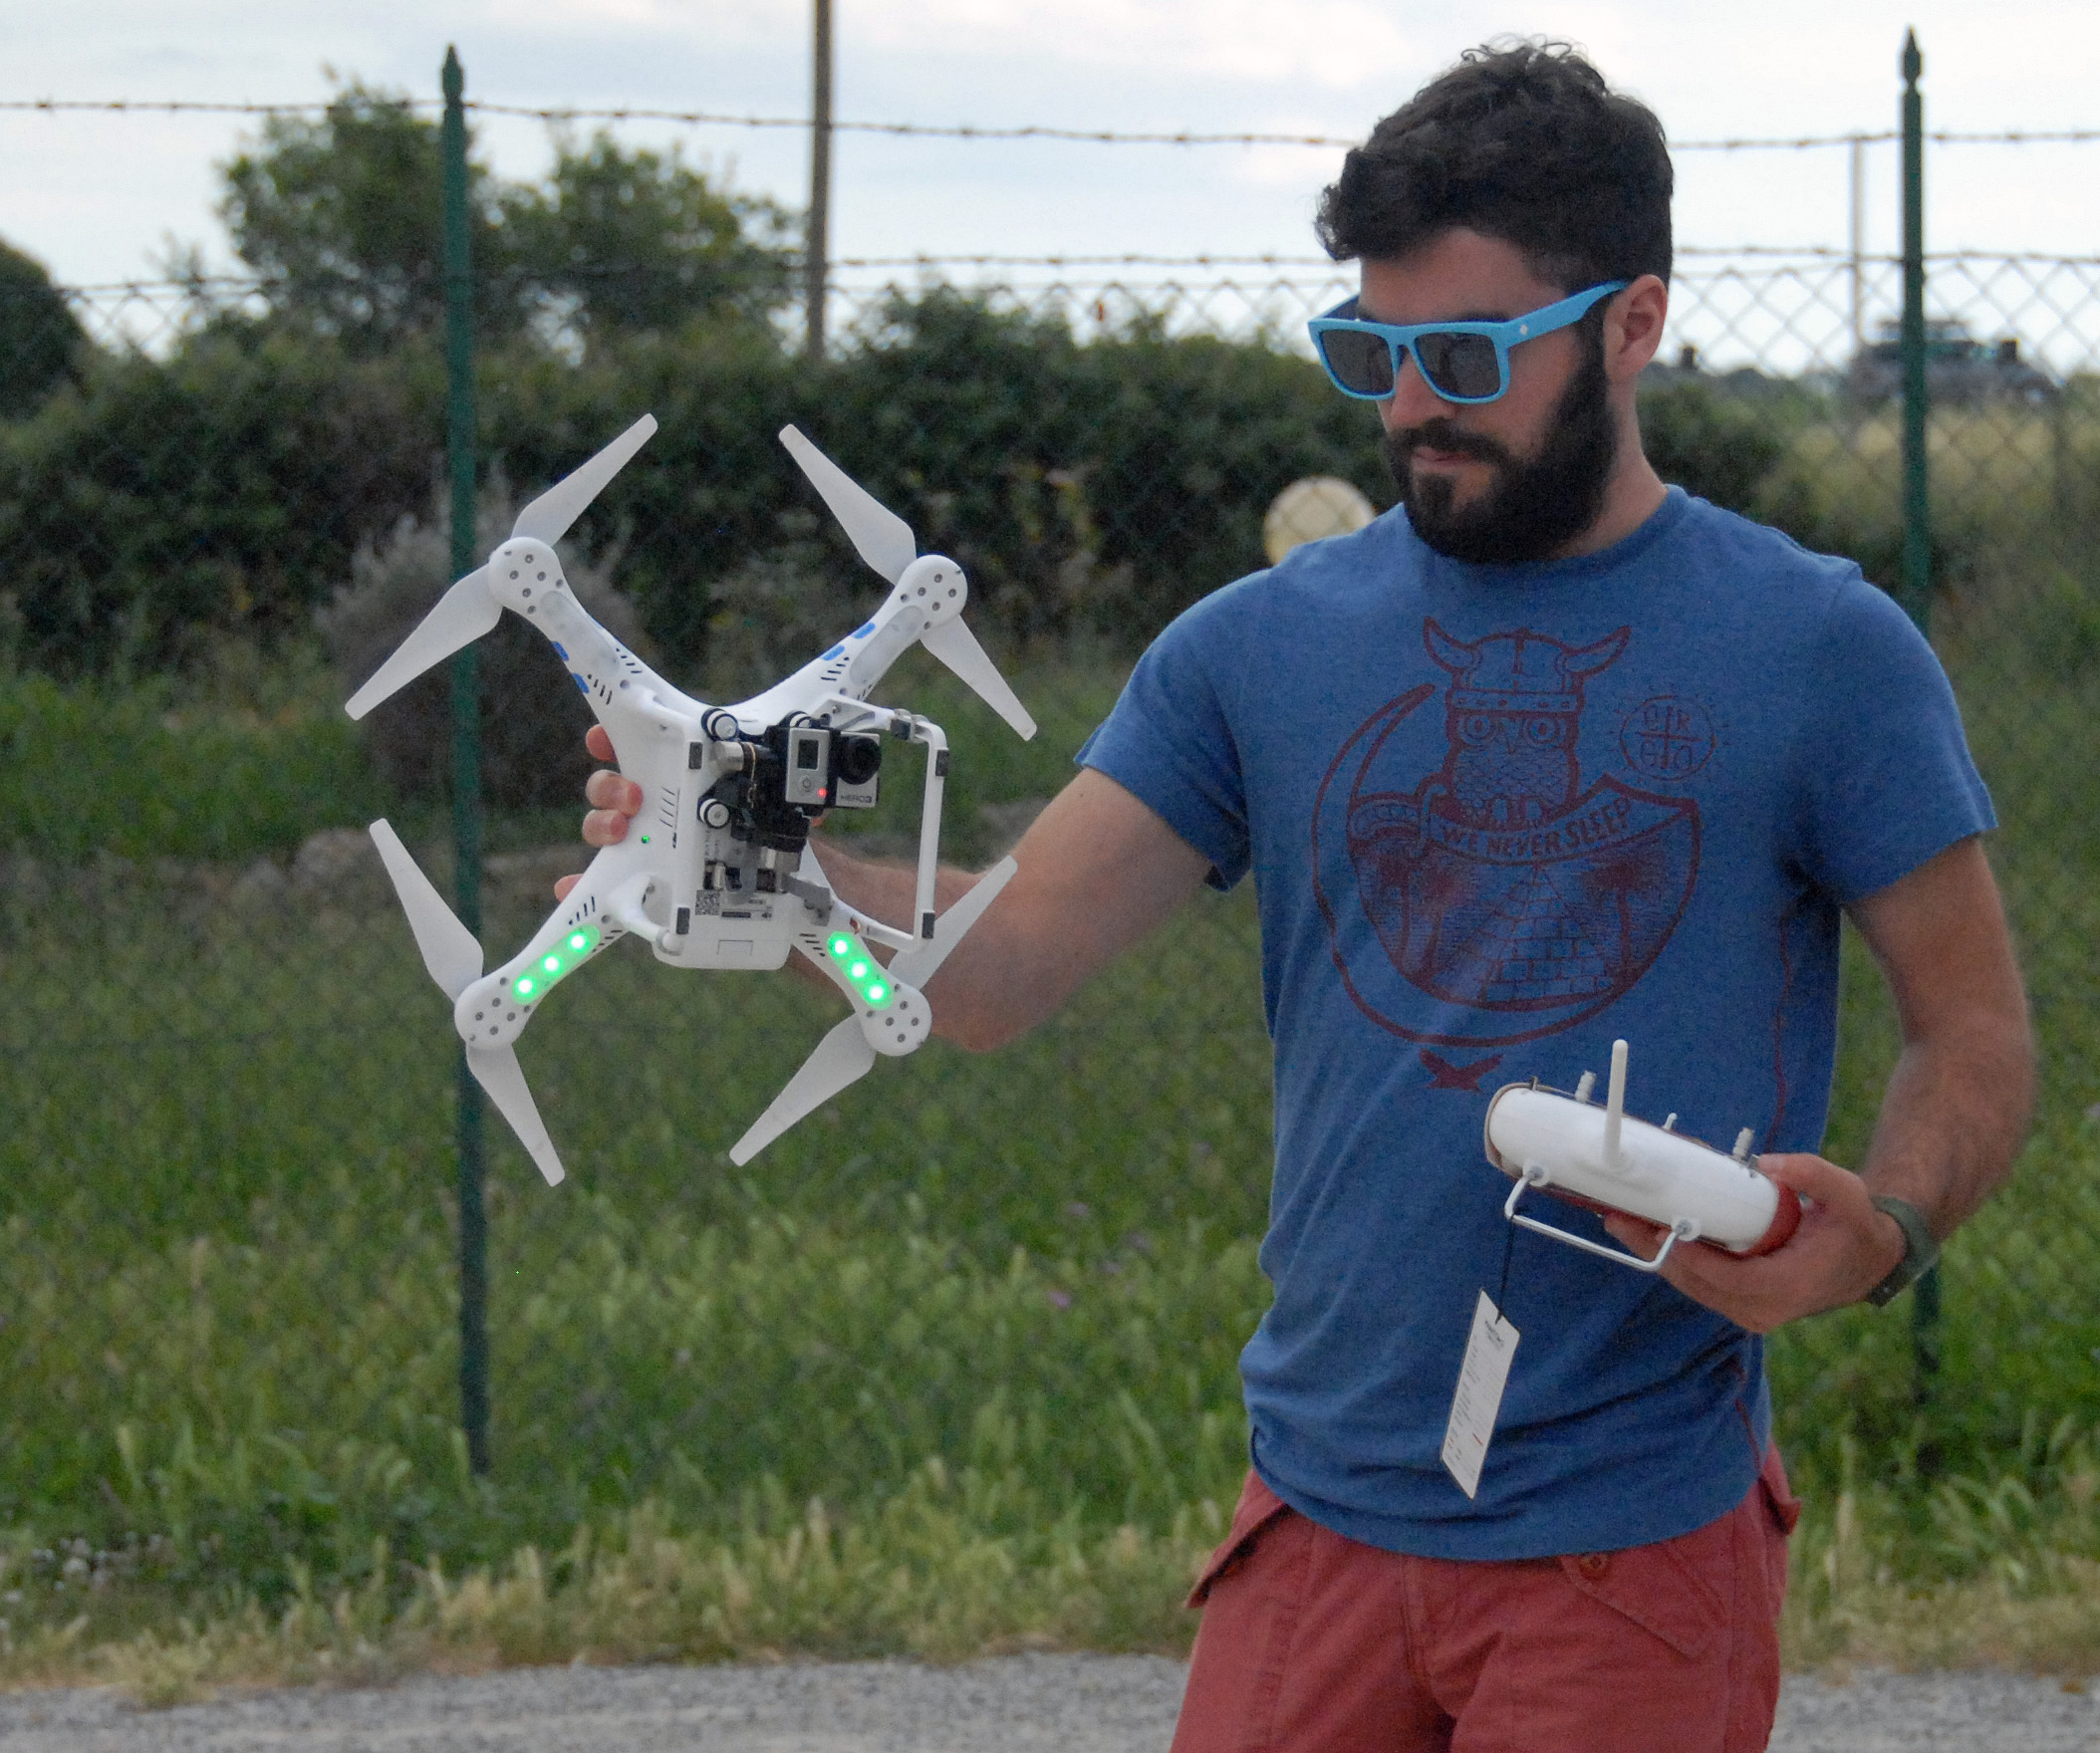 Matthew brennan prepares the quadcopter